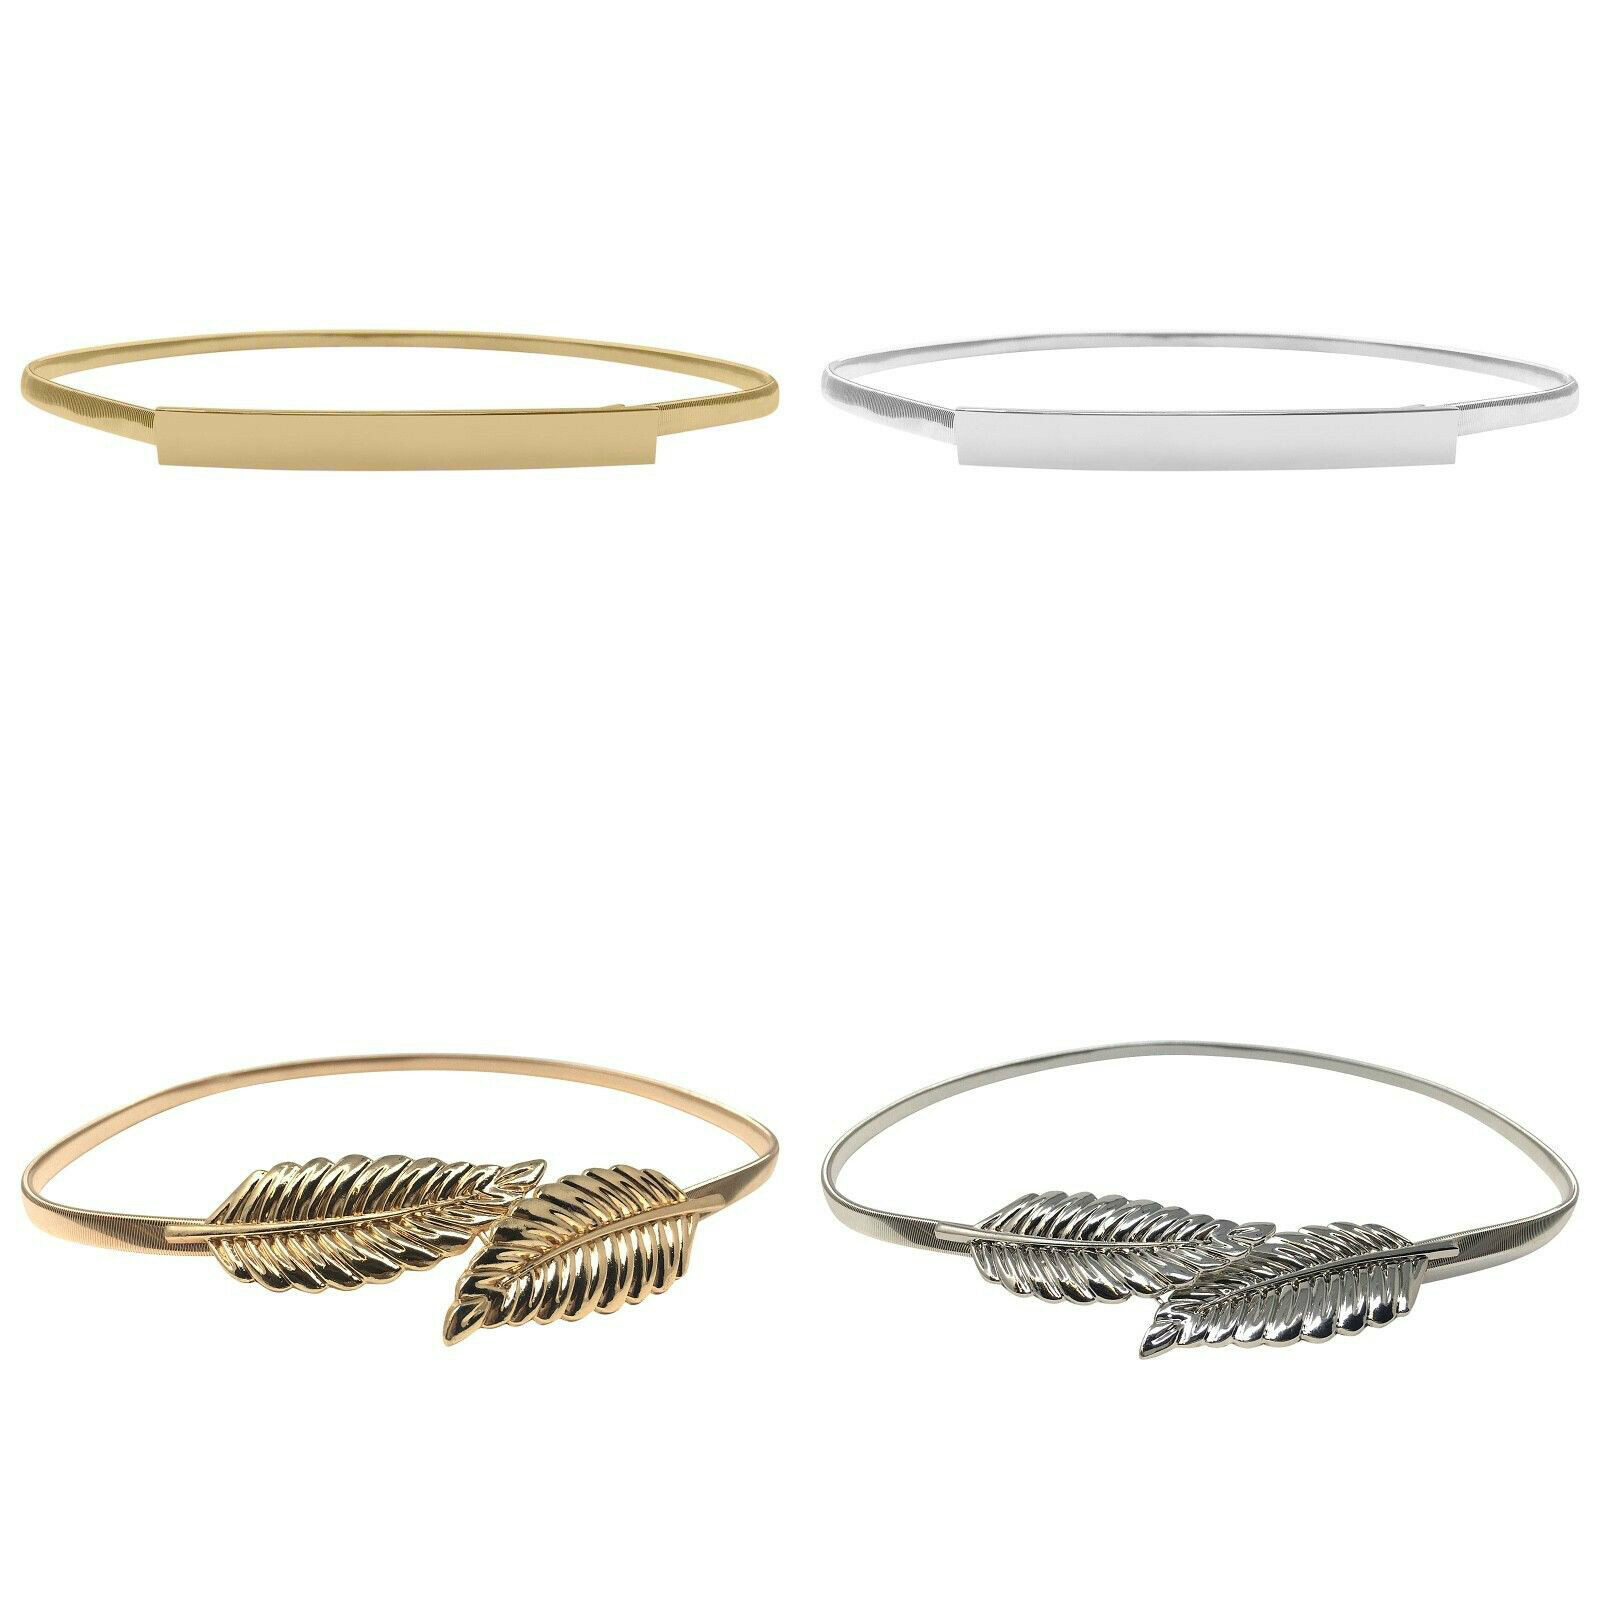 Hot Sale Womens Ladies Fashion Gold Leaves Metal Elastic Thin Skinny Belt Waist Band 2 Styles